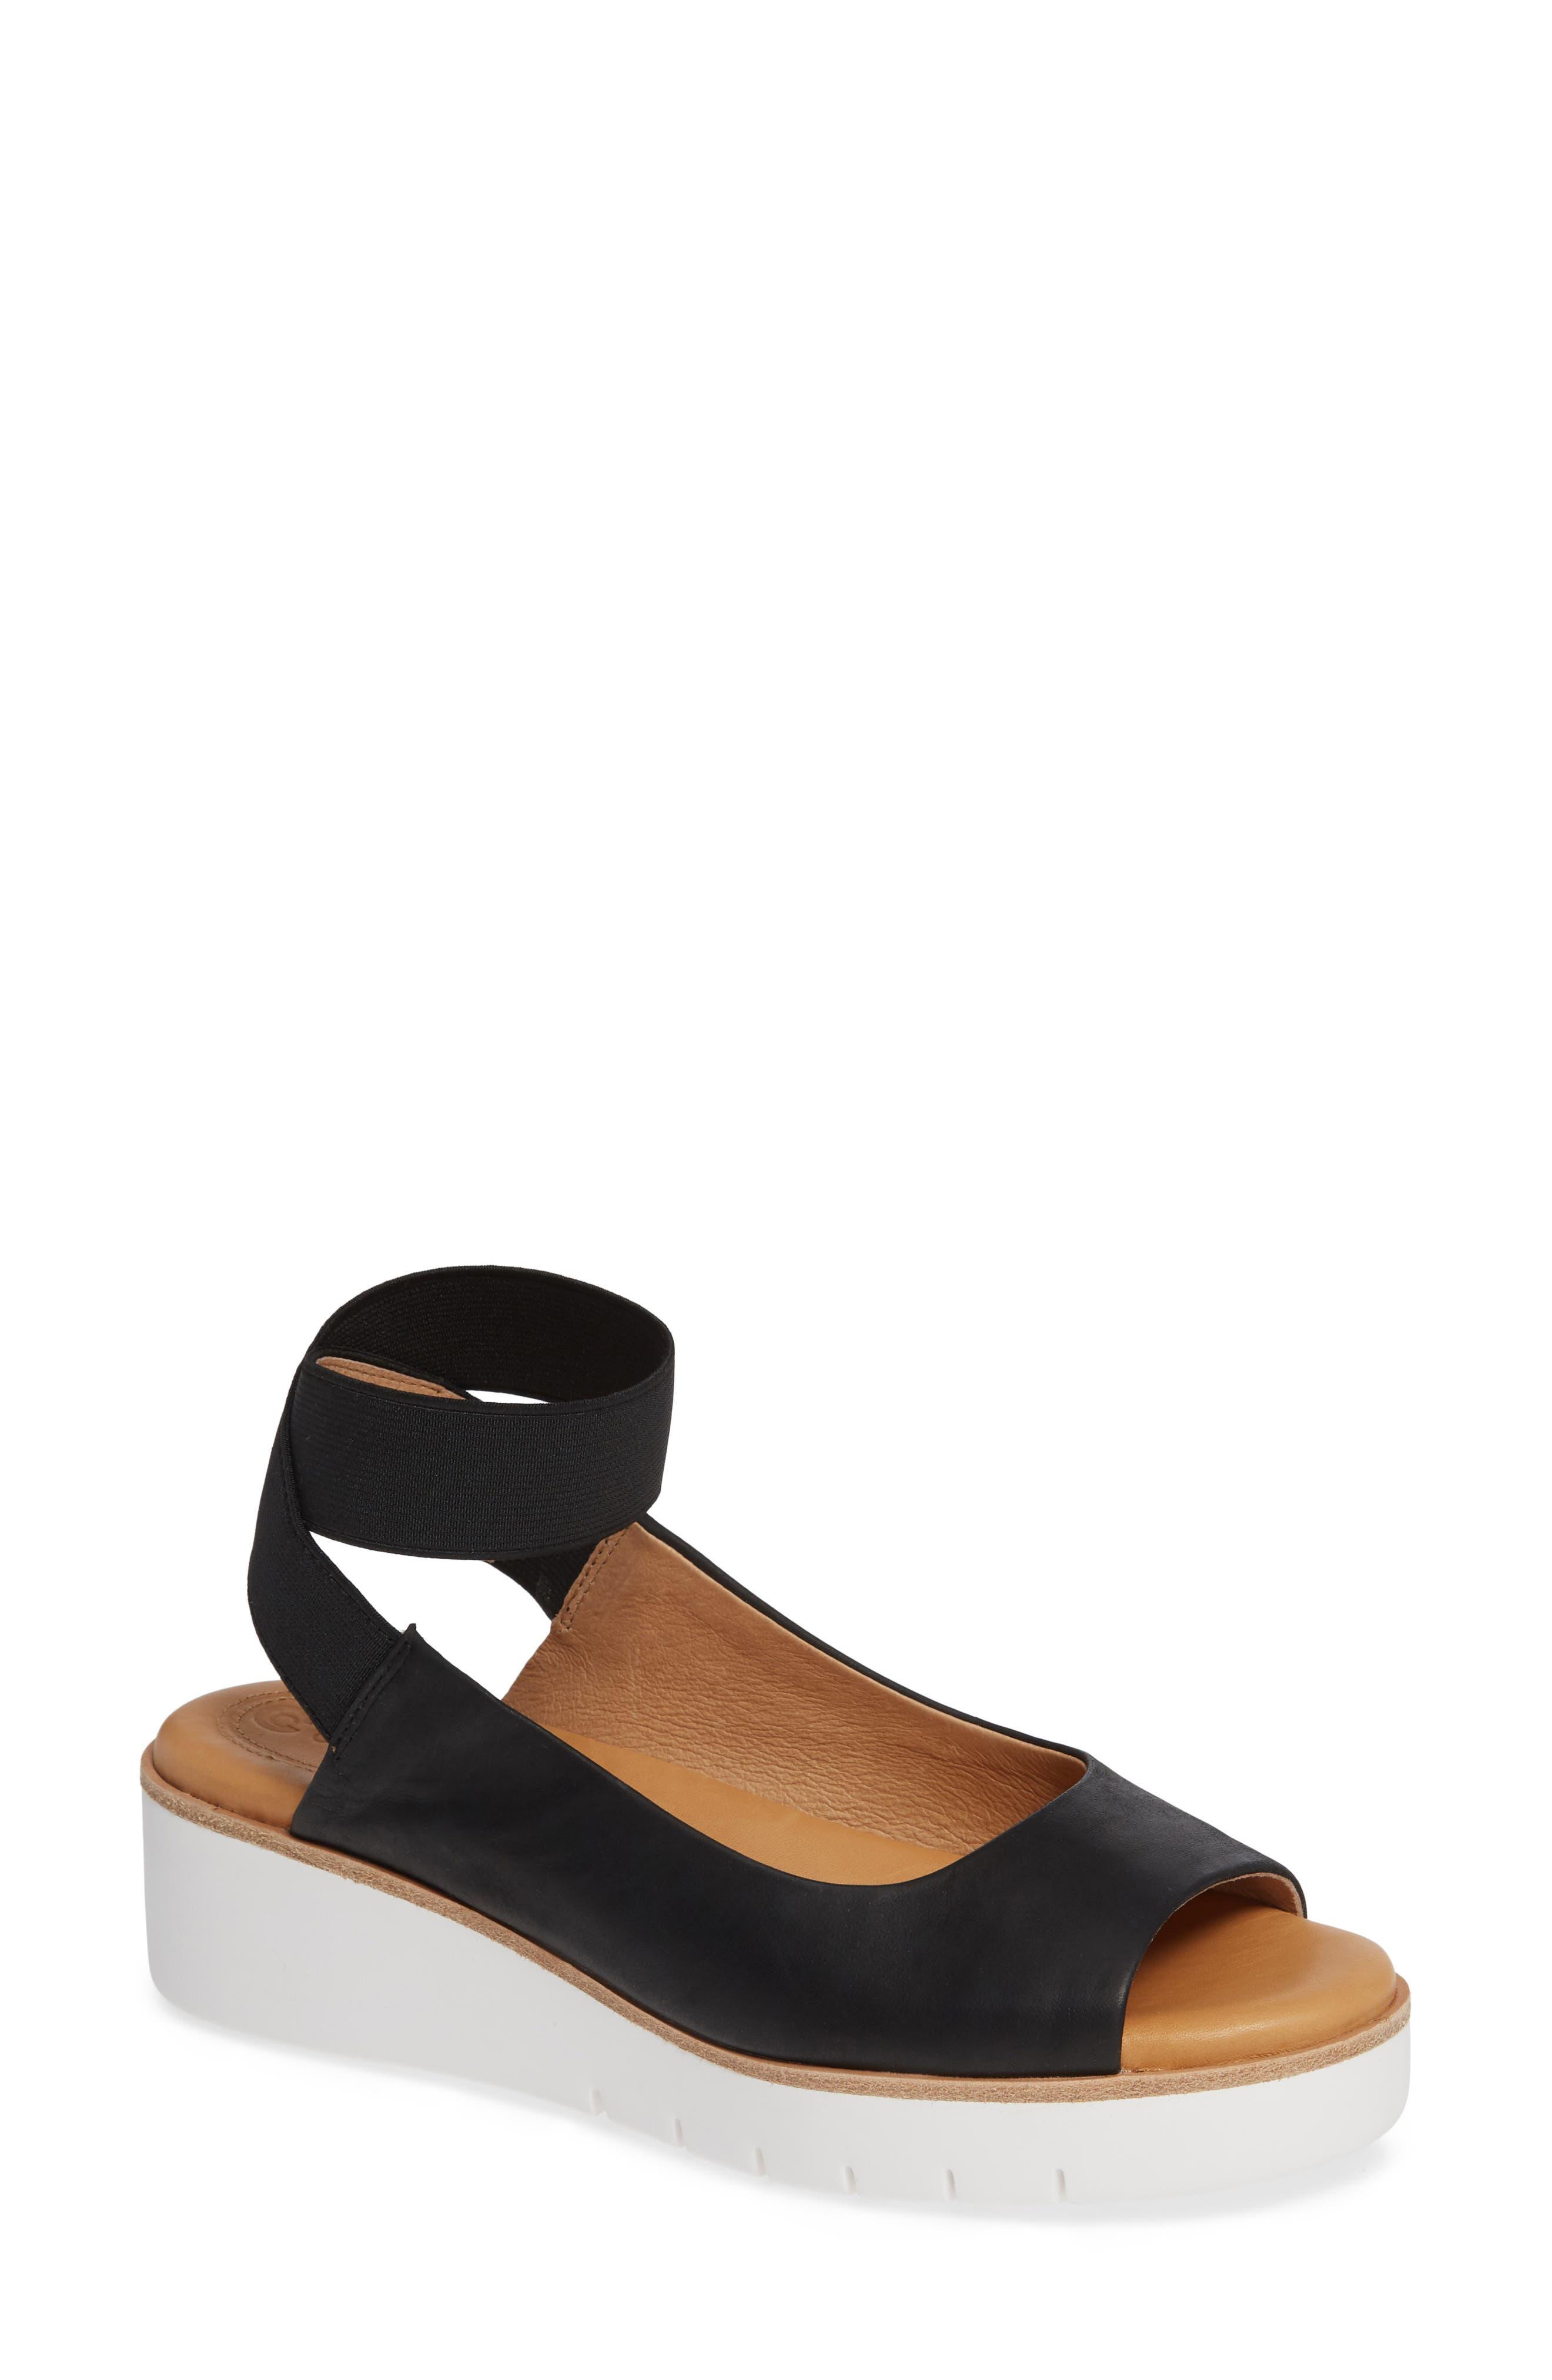 Beeata Wedge Sandal,                             Main thumbnail 1, color,                             BLACK LEATHER